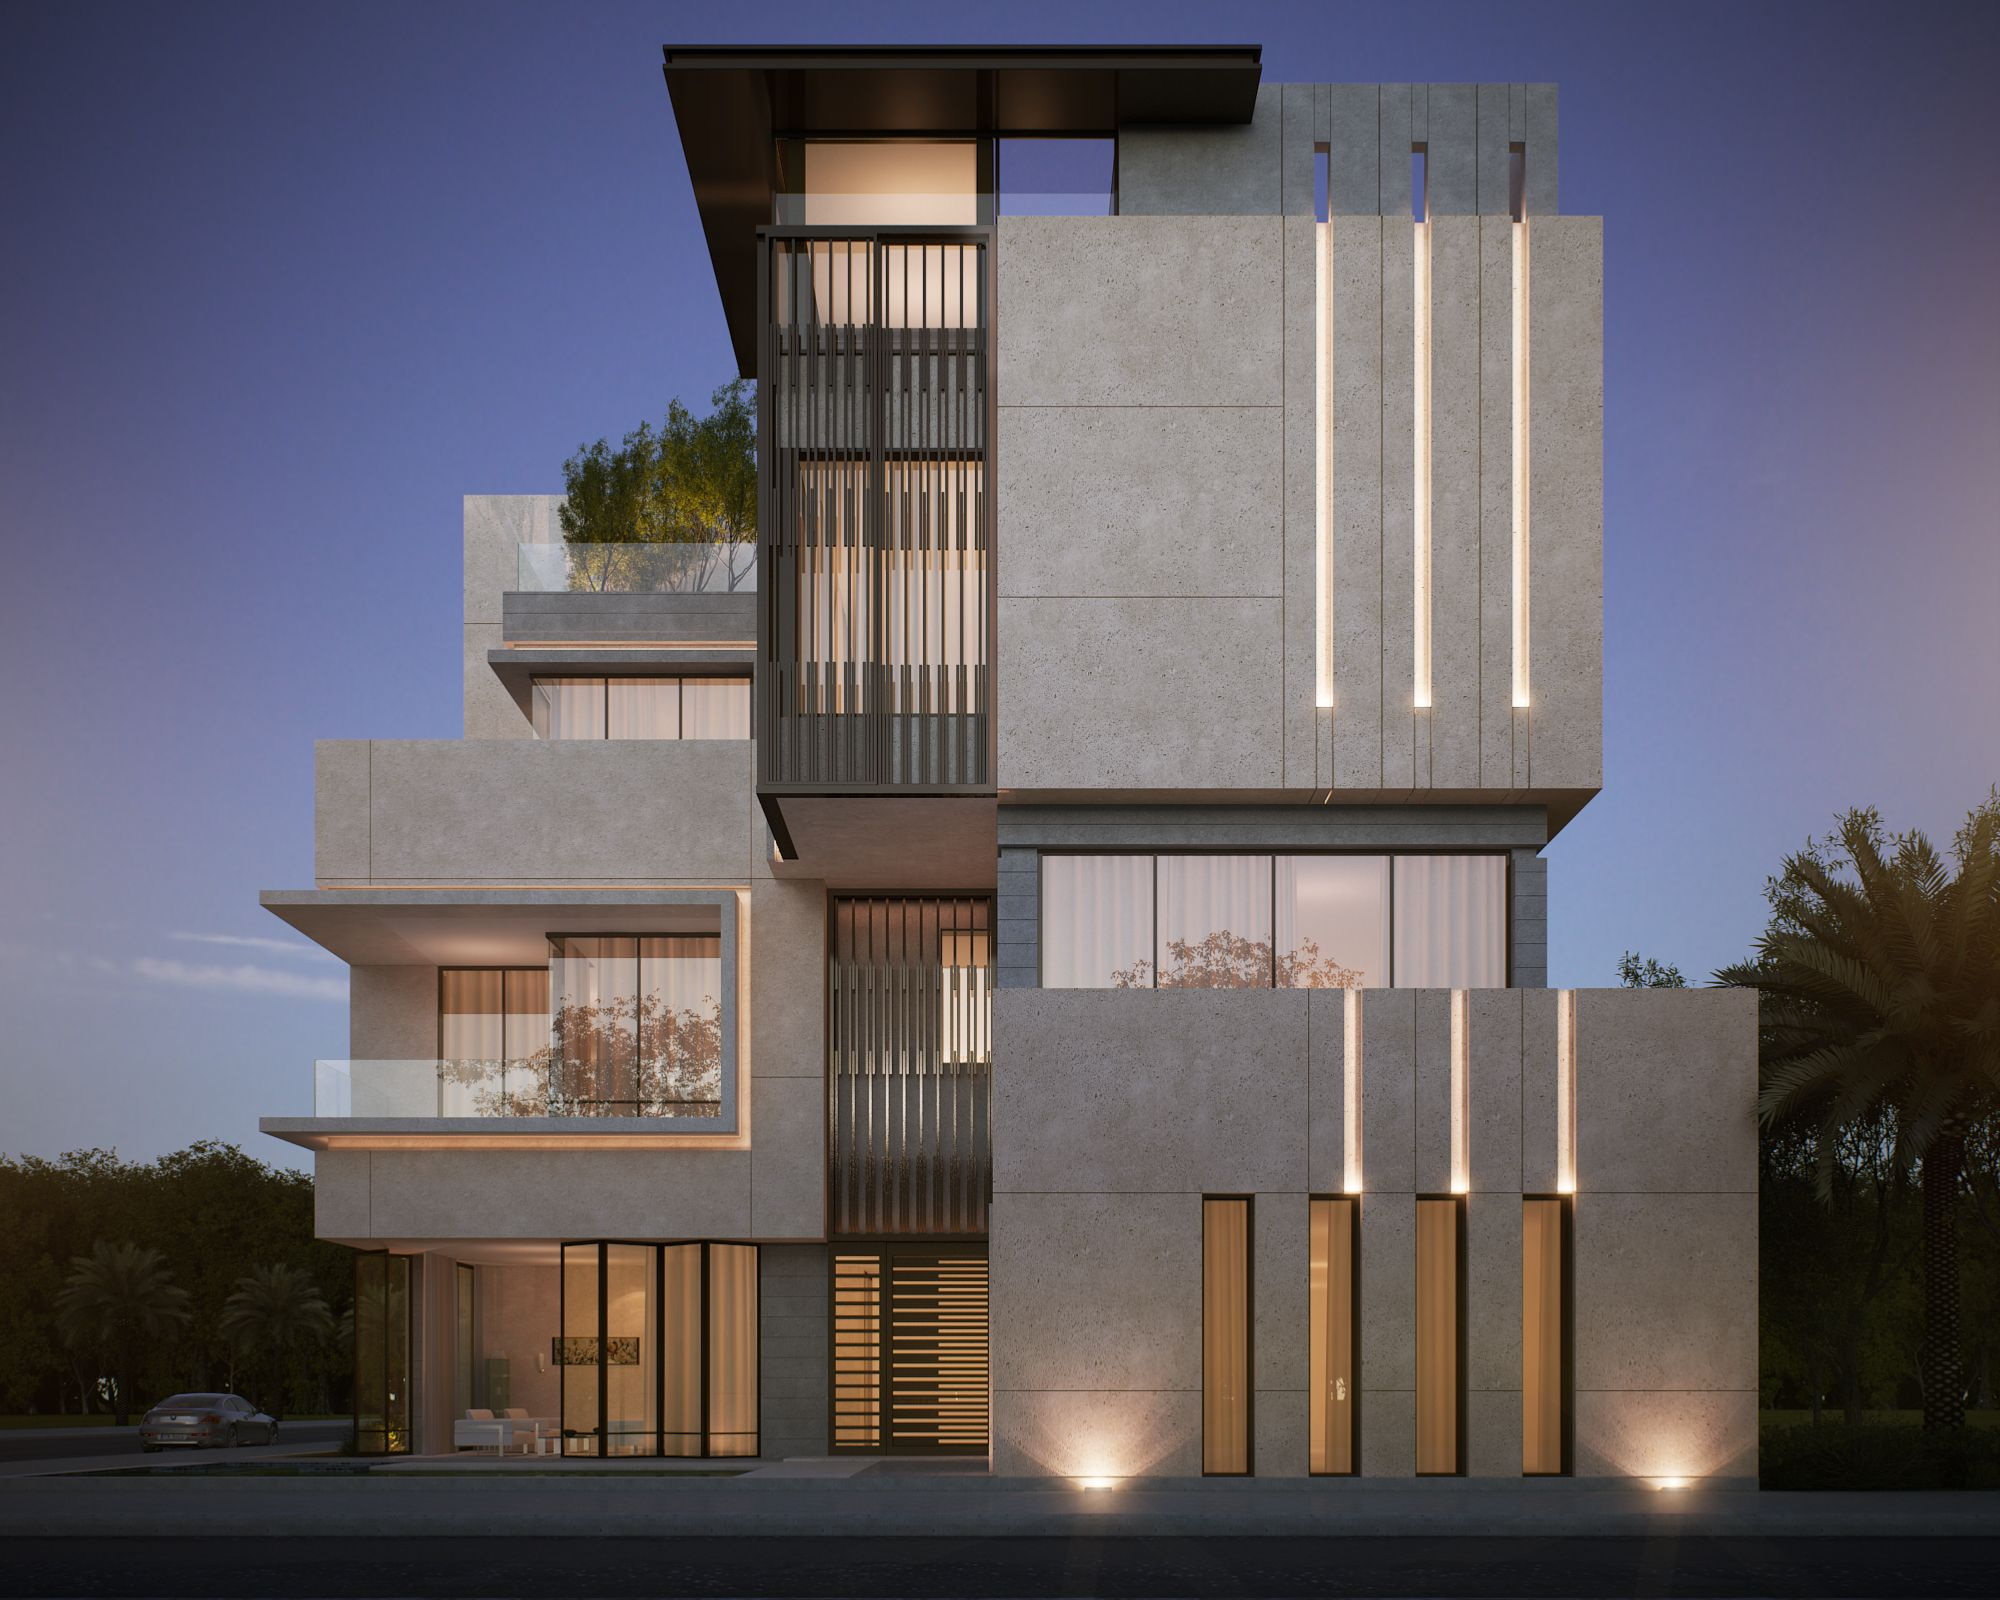 private villa 500 m kuwait sarah sadeq architects sarah sadeq architectes pinterest casas. Black Bedroom Furniture Sets. Home Design Ideas